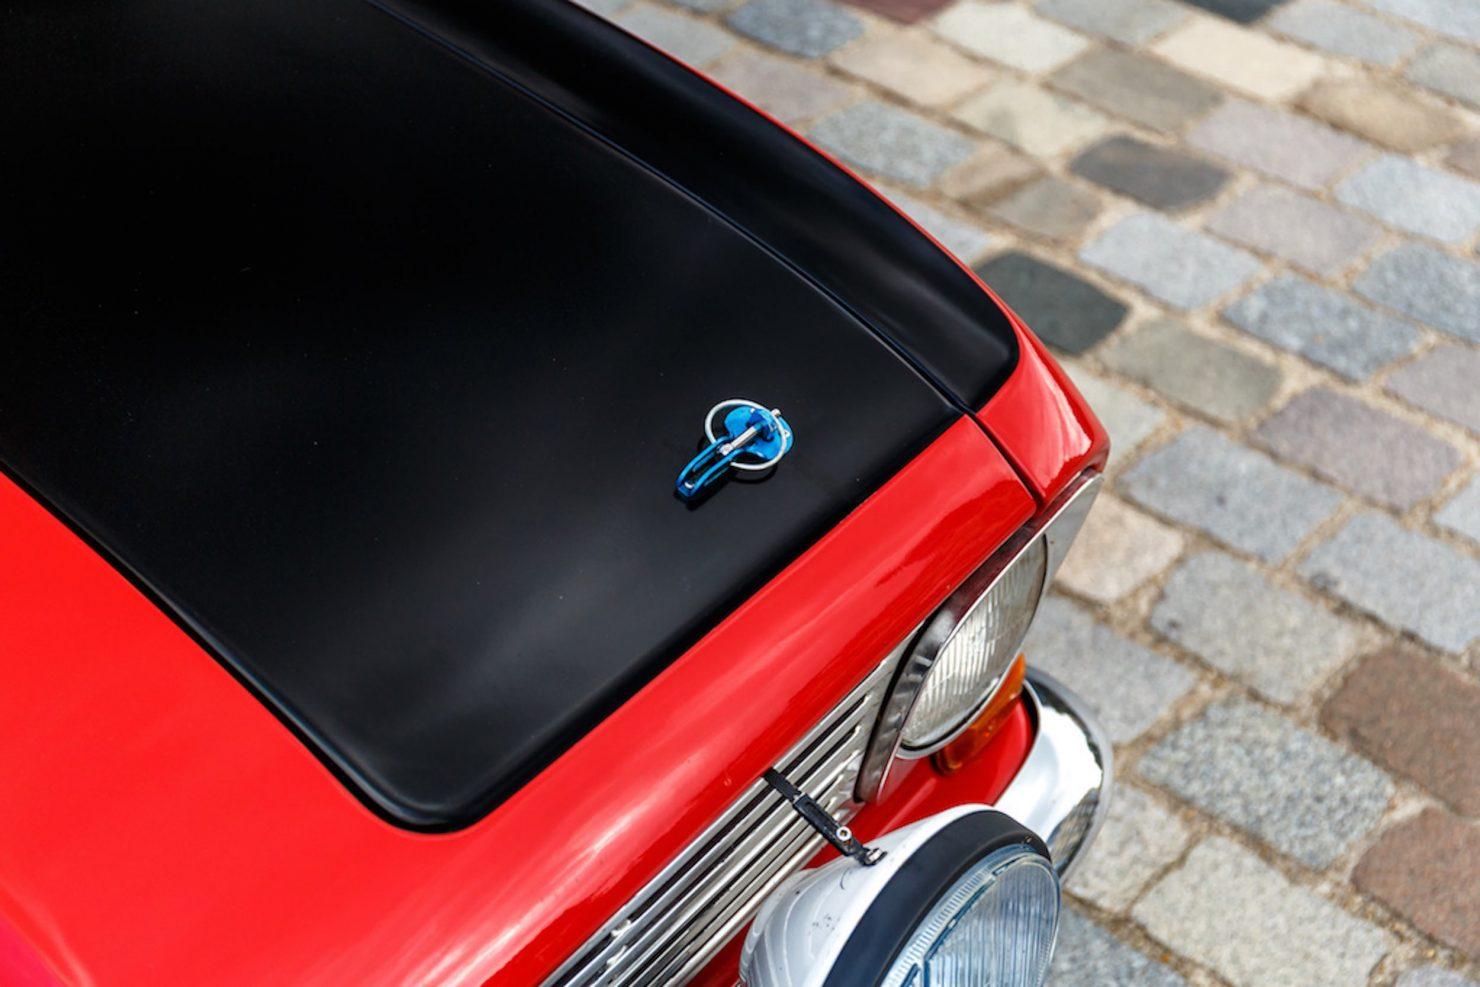 opel kadett rallye car 6 1480x987 - 1969 Opel Rallye Kadett